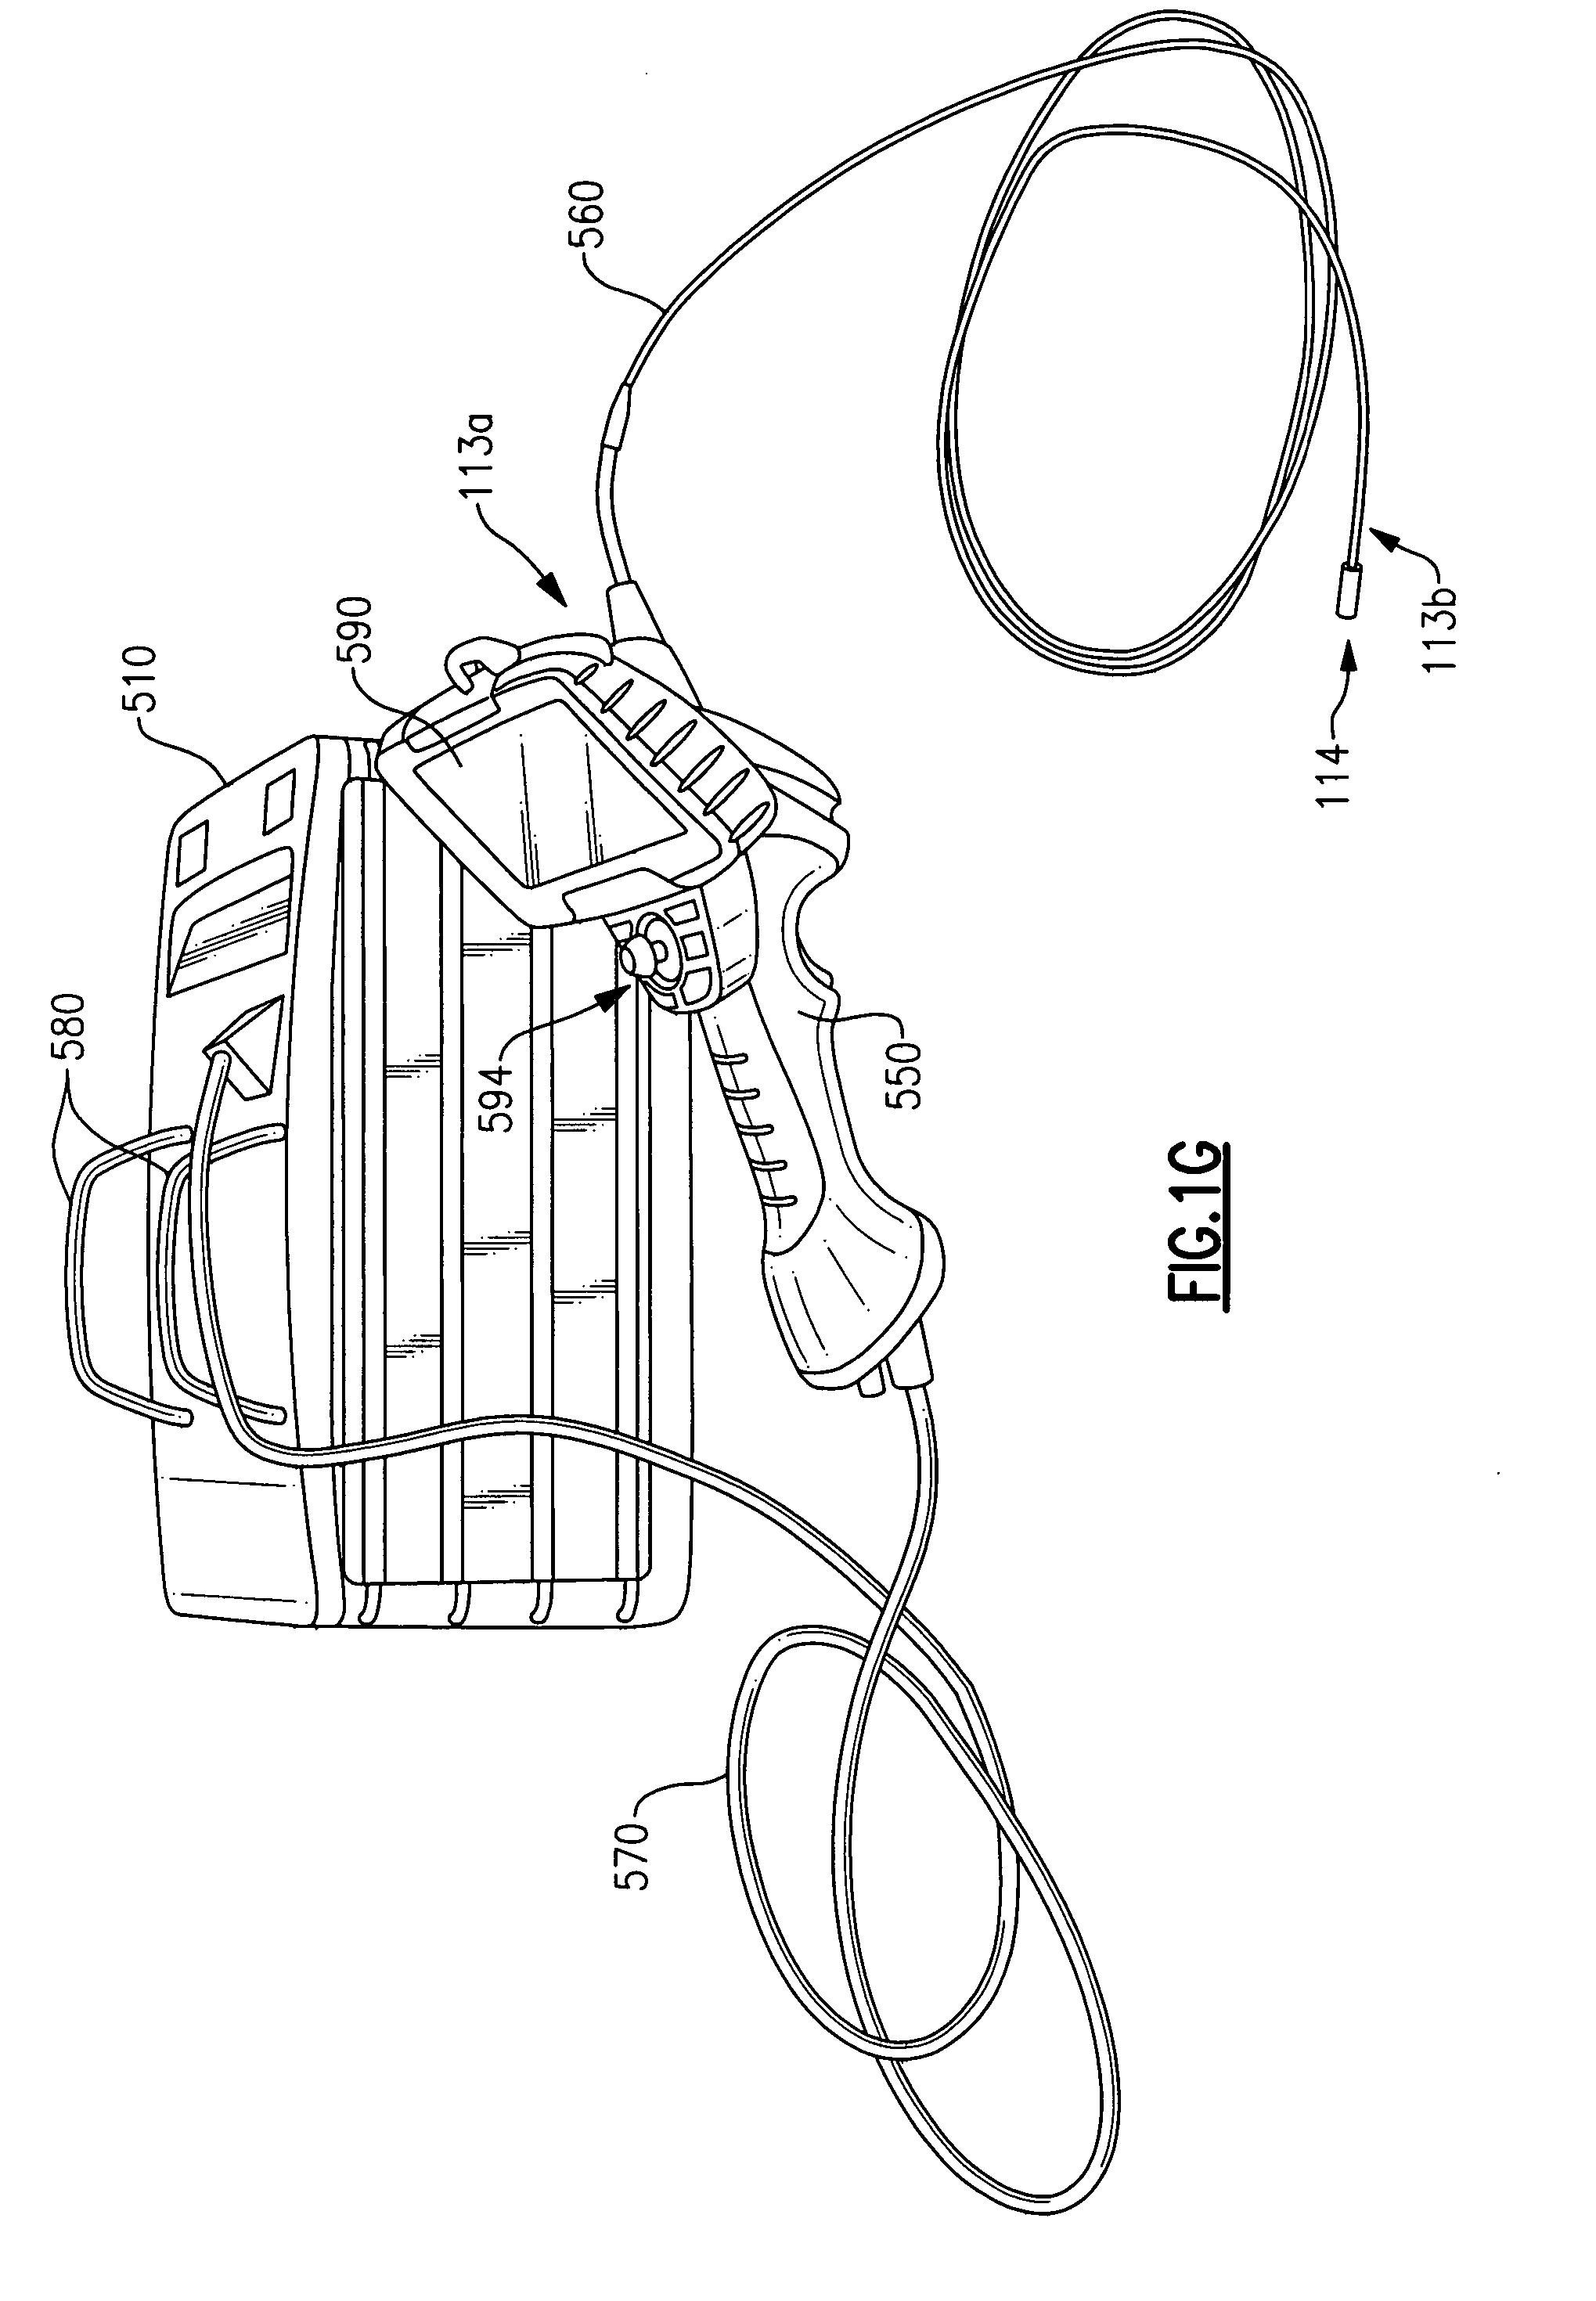 Wireless Headset Communication System. Diagram. Auto